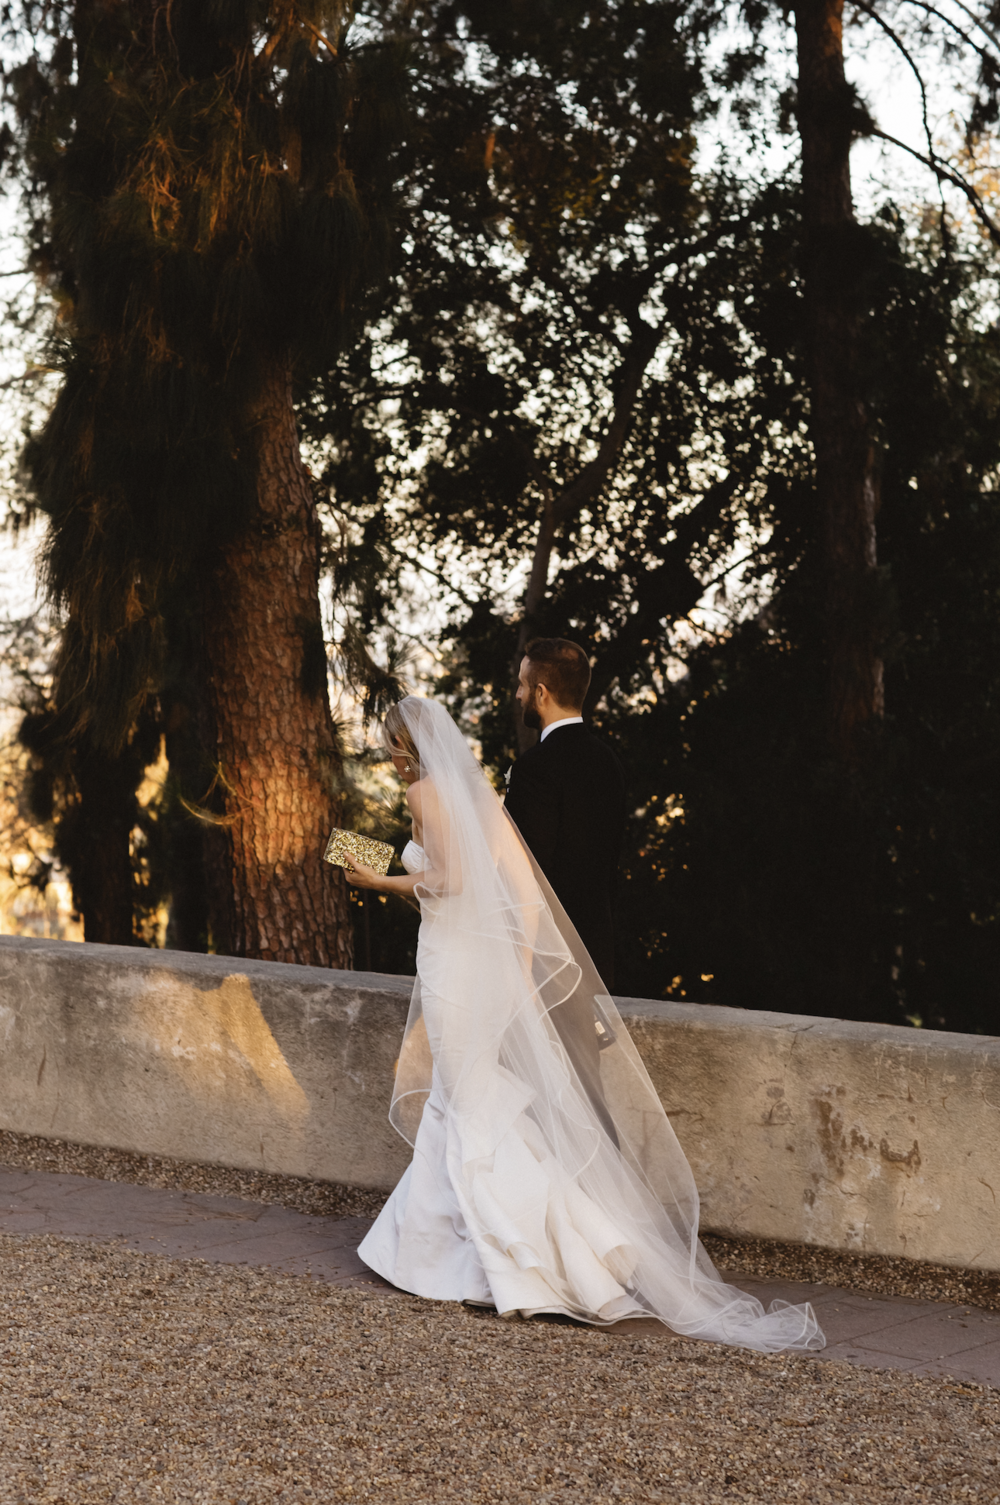 HAILLEY+HOWARD+DESTINATION+WEDDING+PHOTOGRAPHER_+WEDDING+PHOTOGRAPHER+LOS+ANGELES_FAIRY+TALE.png